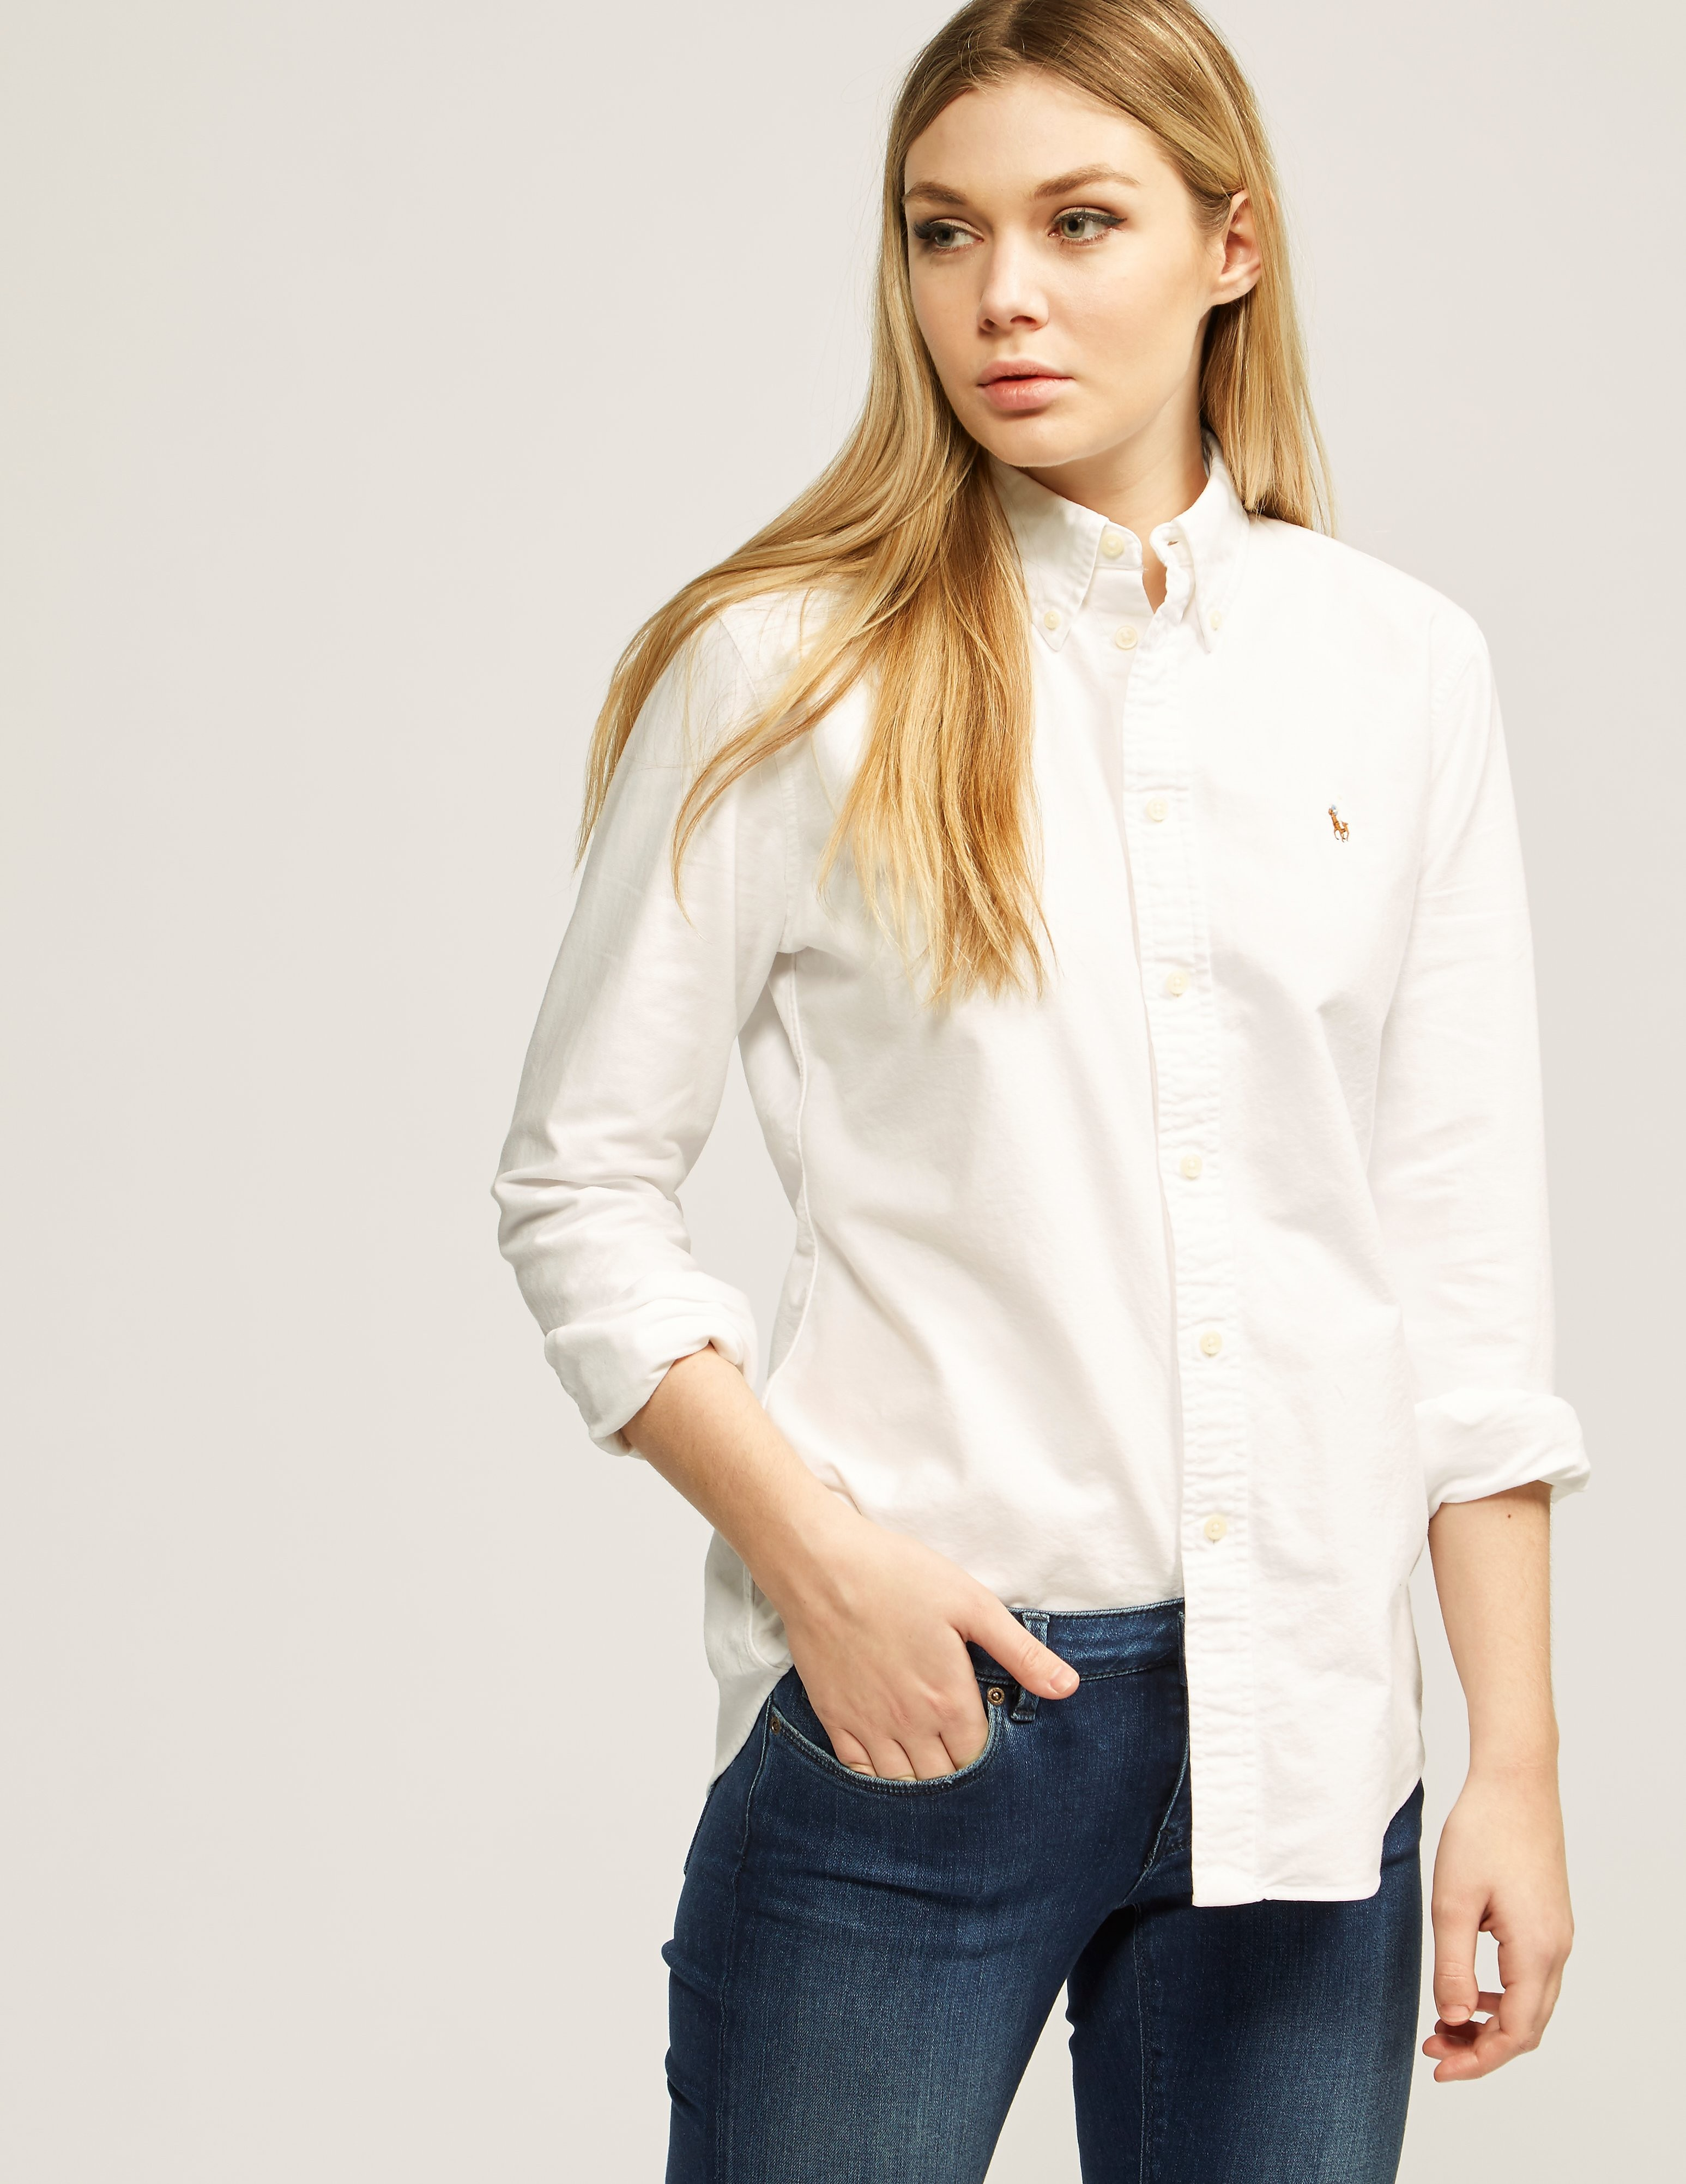 ace8fbe17c6 Womens Polo Ralph Lauren Harper Shirt White